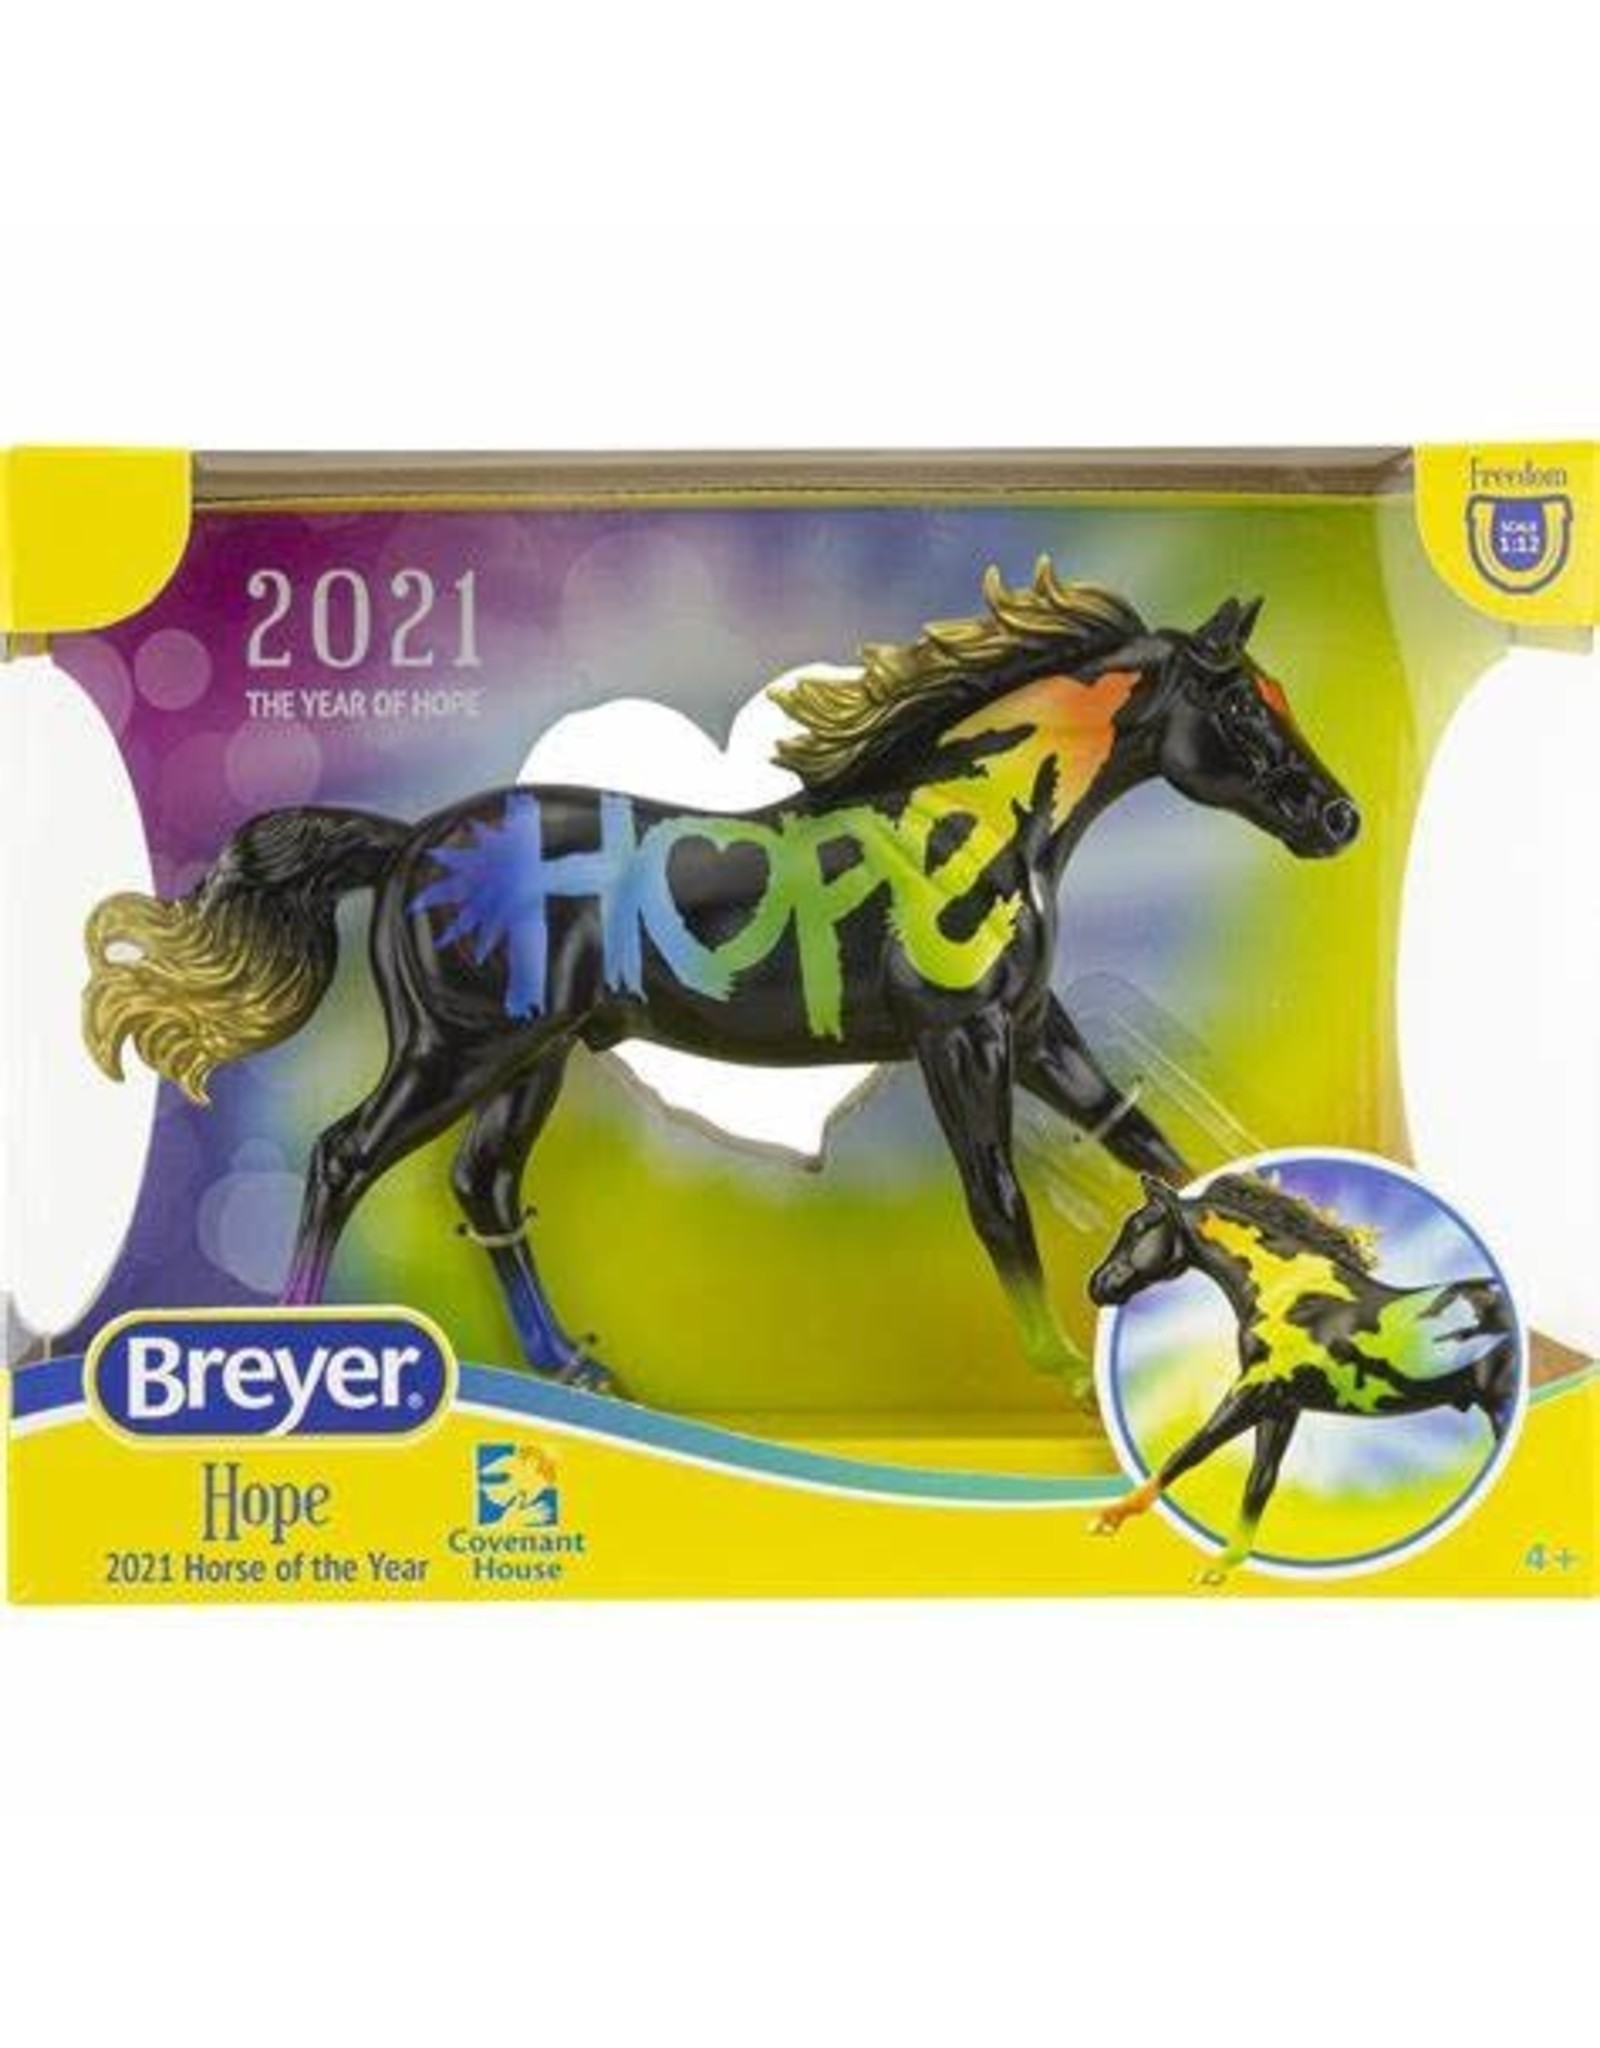 Breyer 2021 Horse of the Year - Hope